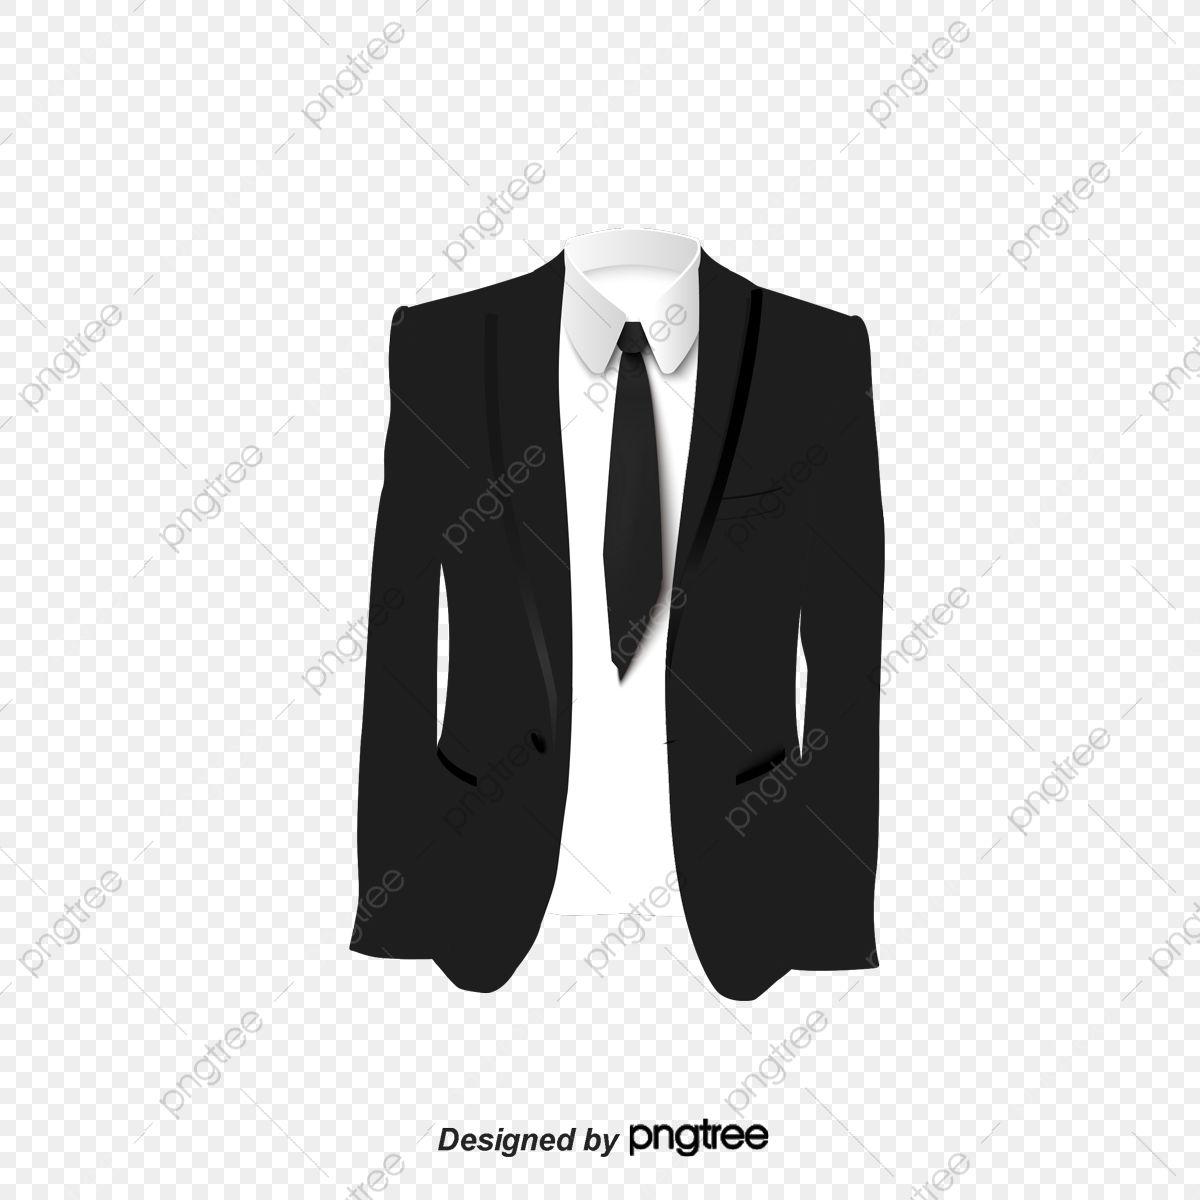 Black Suit Work Photo Template Photo Clipart Clothes Suit Png Transparent Clipart Image And Psd File For Free Download Photo Template Black Suits Photo Clipart